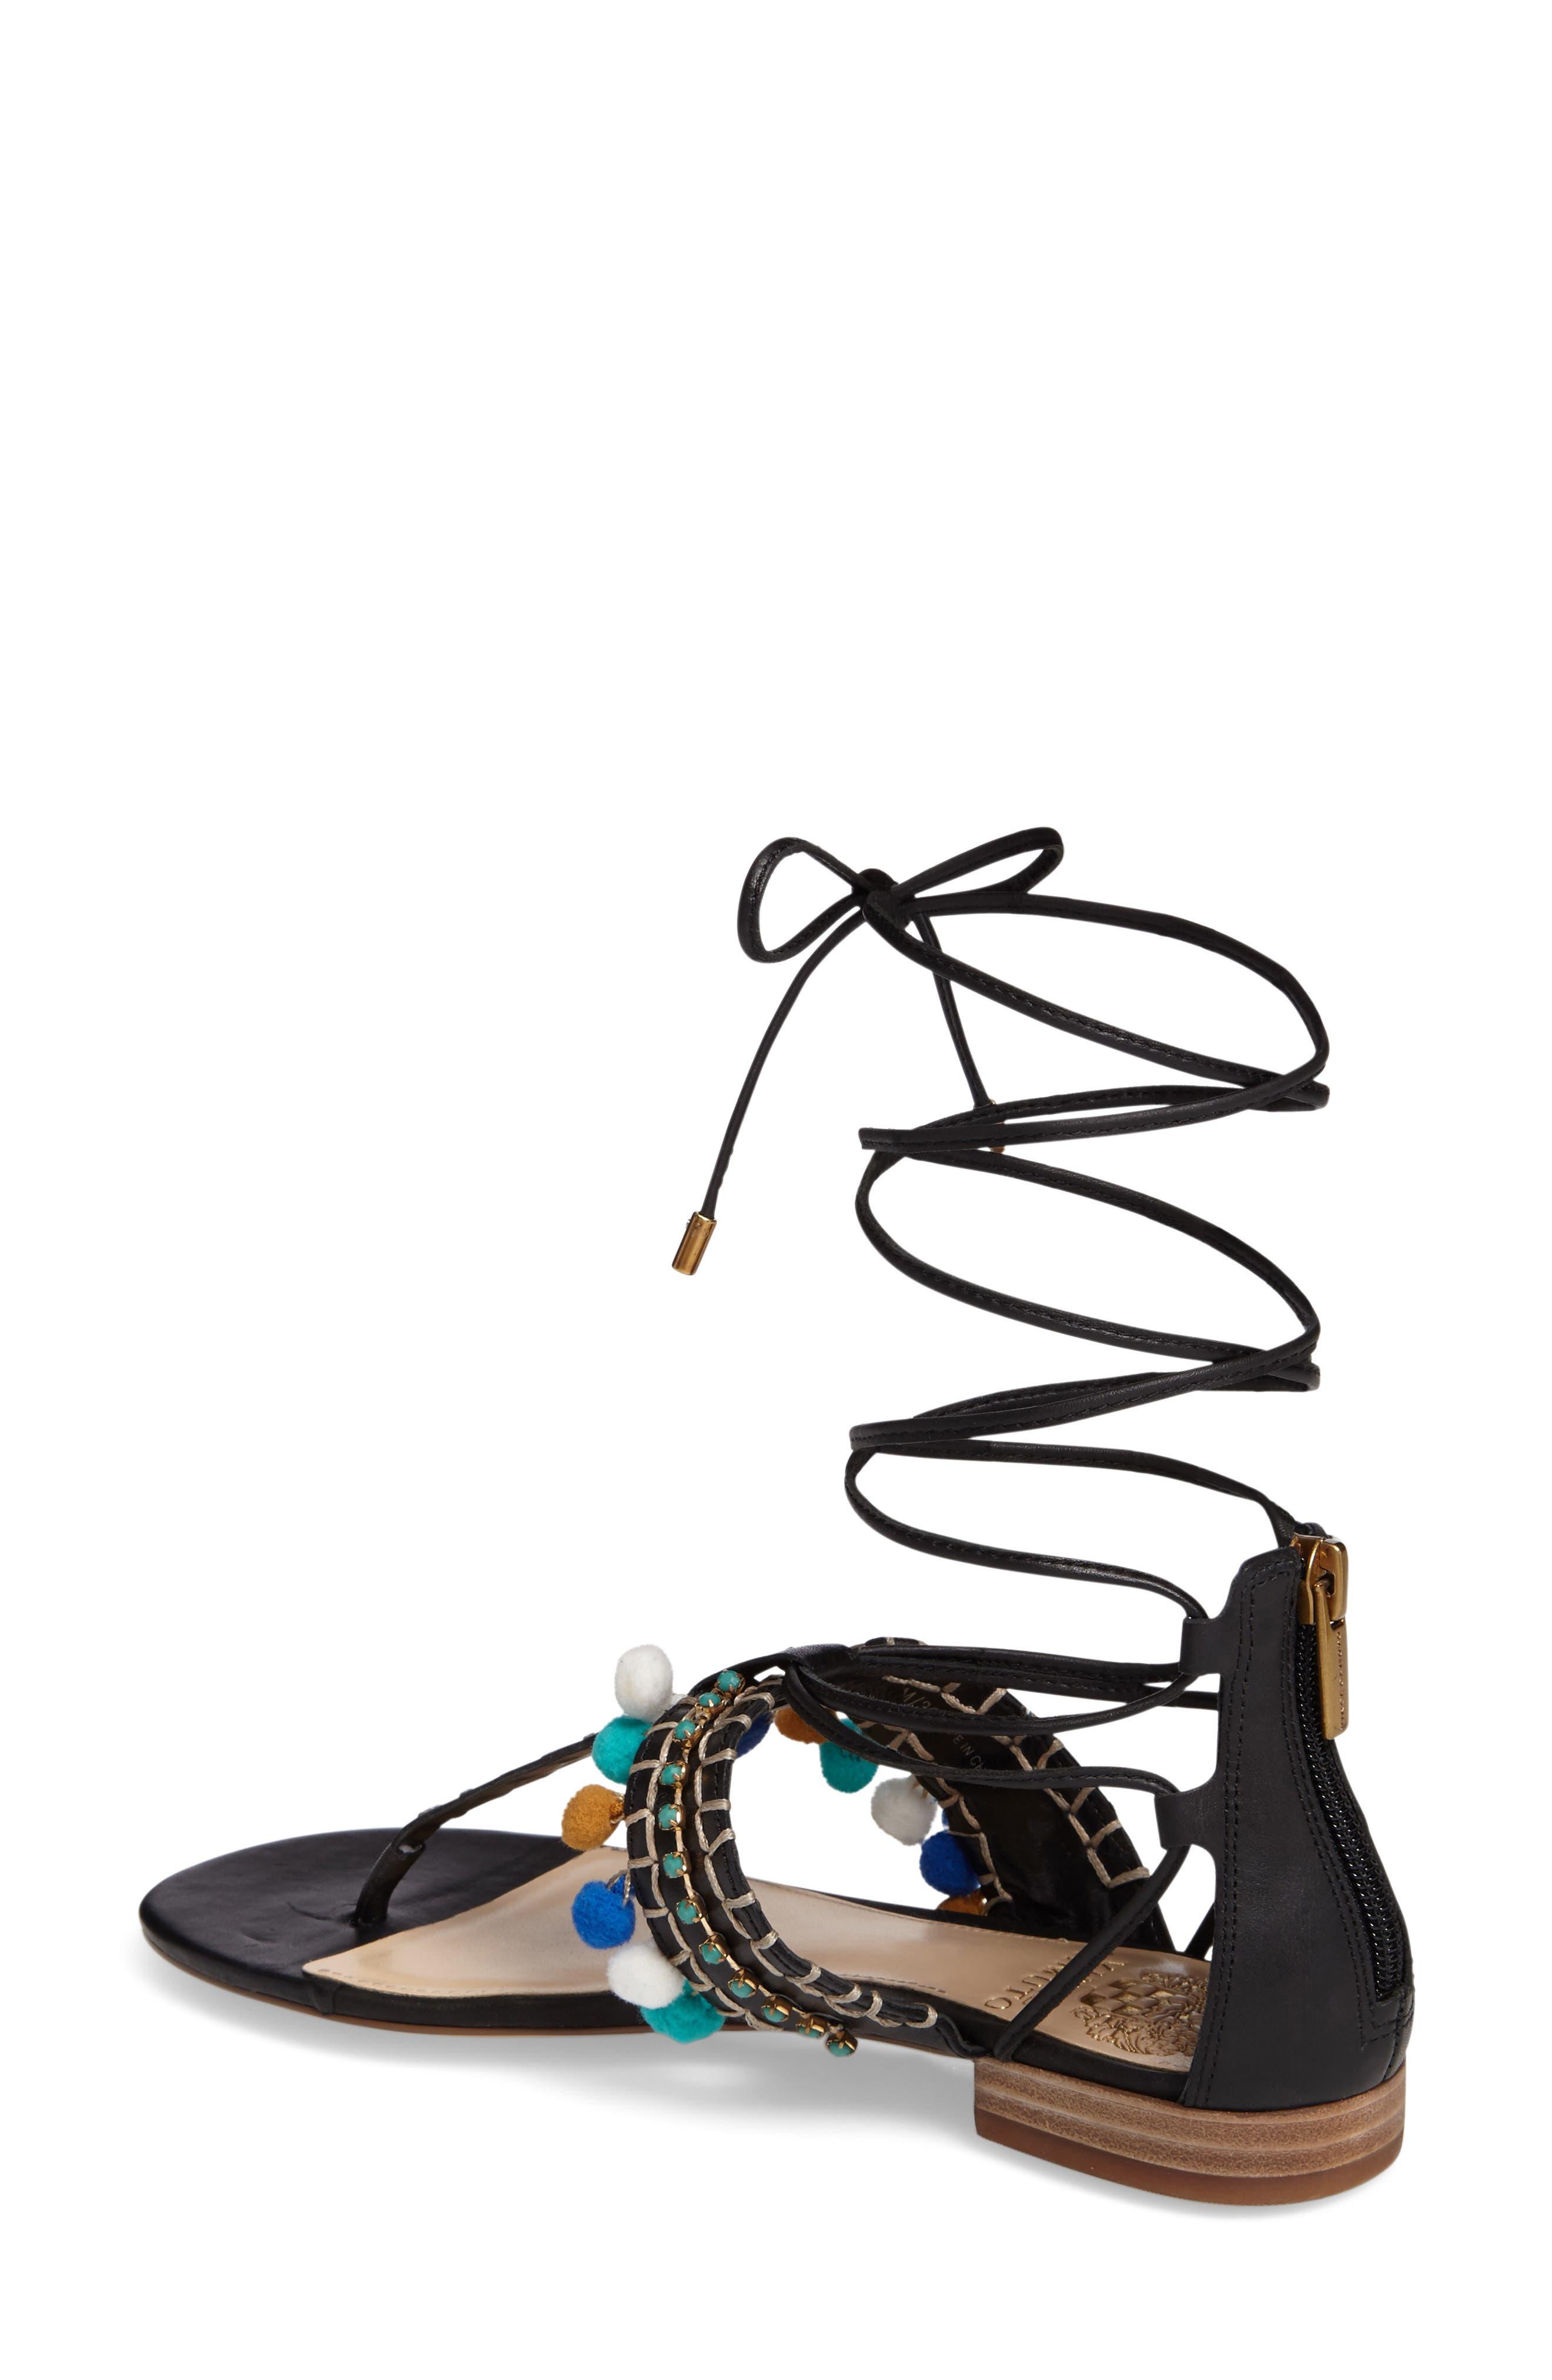 Balisa Embellished Lace-Up Sandal,                             Alternate thumbnail 2, color,                             001